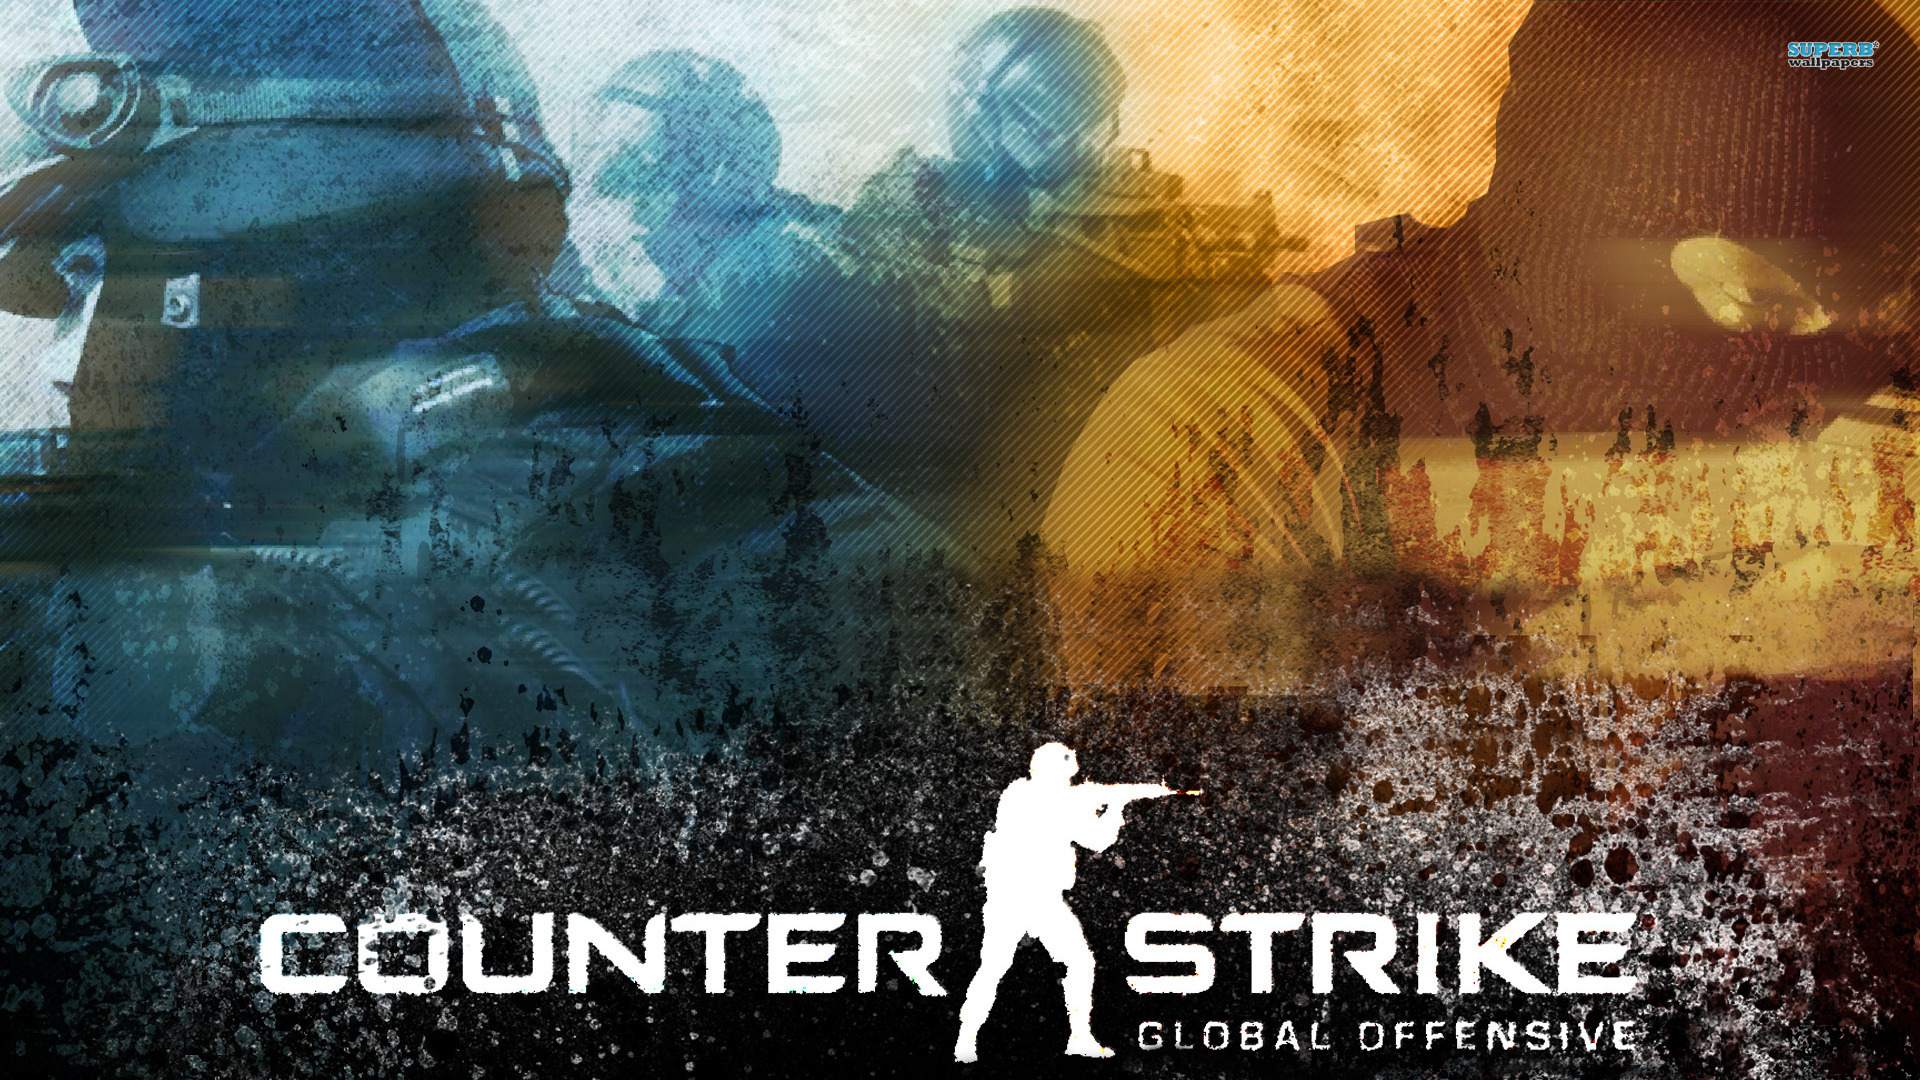 1384951595 counter strike global offensive 14747 1920x1080jpg 1920x1080